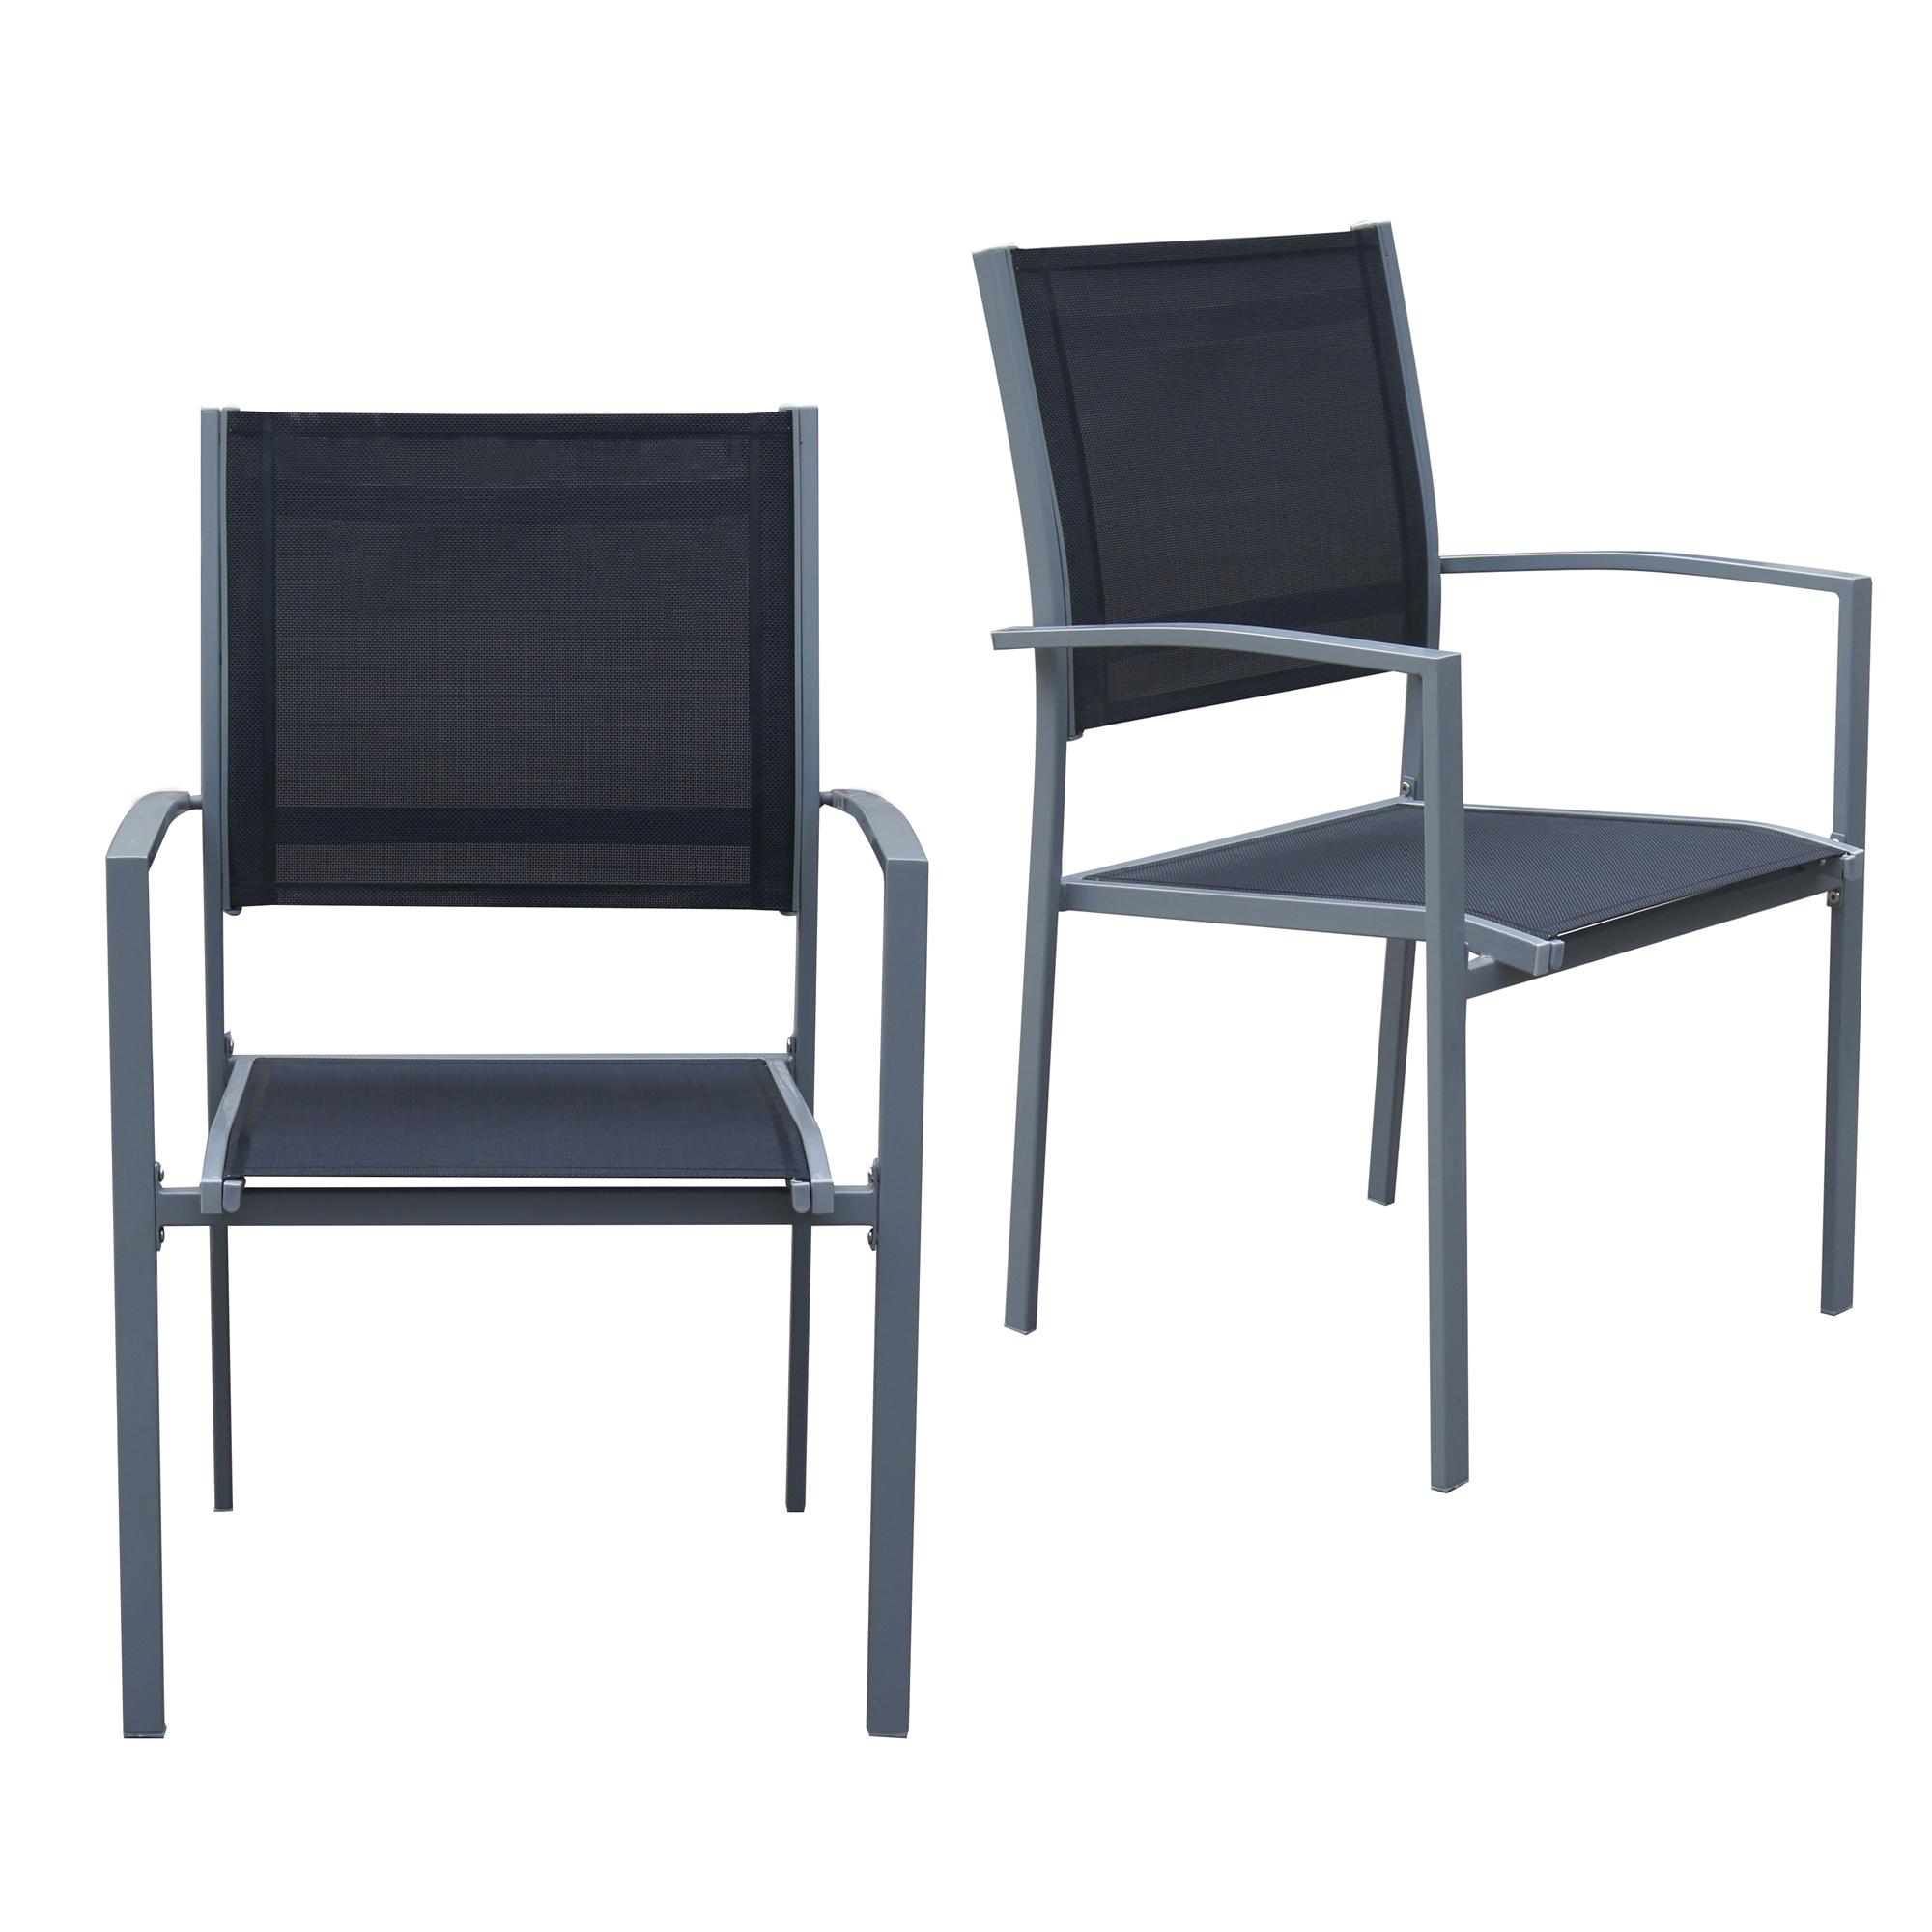 jalano gartenstuhl wei wetterfest stapelstuhl 2er set terrasse stuhl b ware ebay. Black Bedroom Furniture Sets. Home Design Ideas